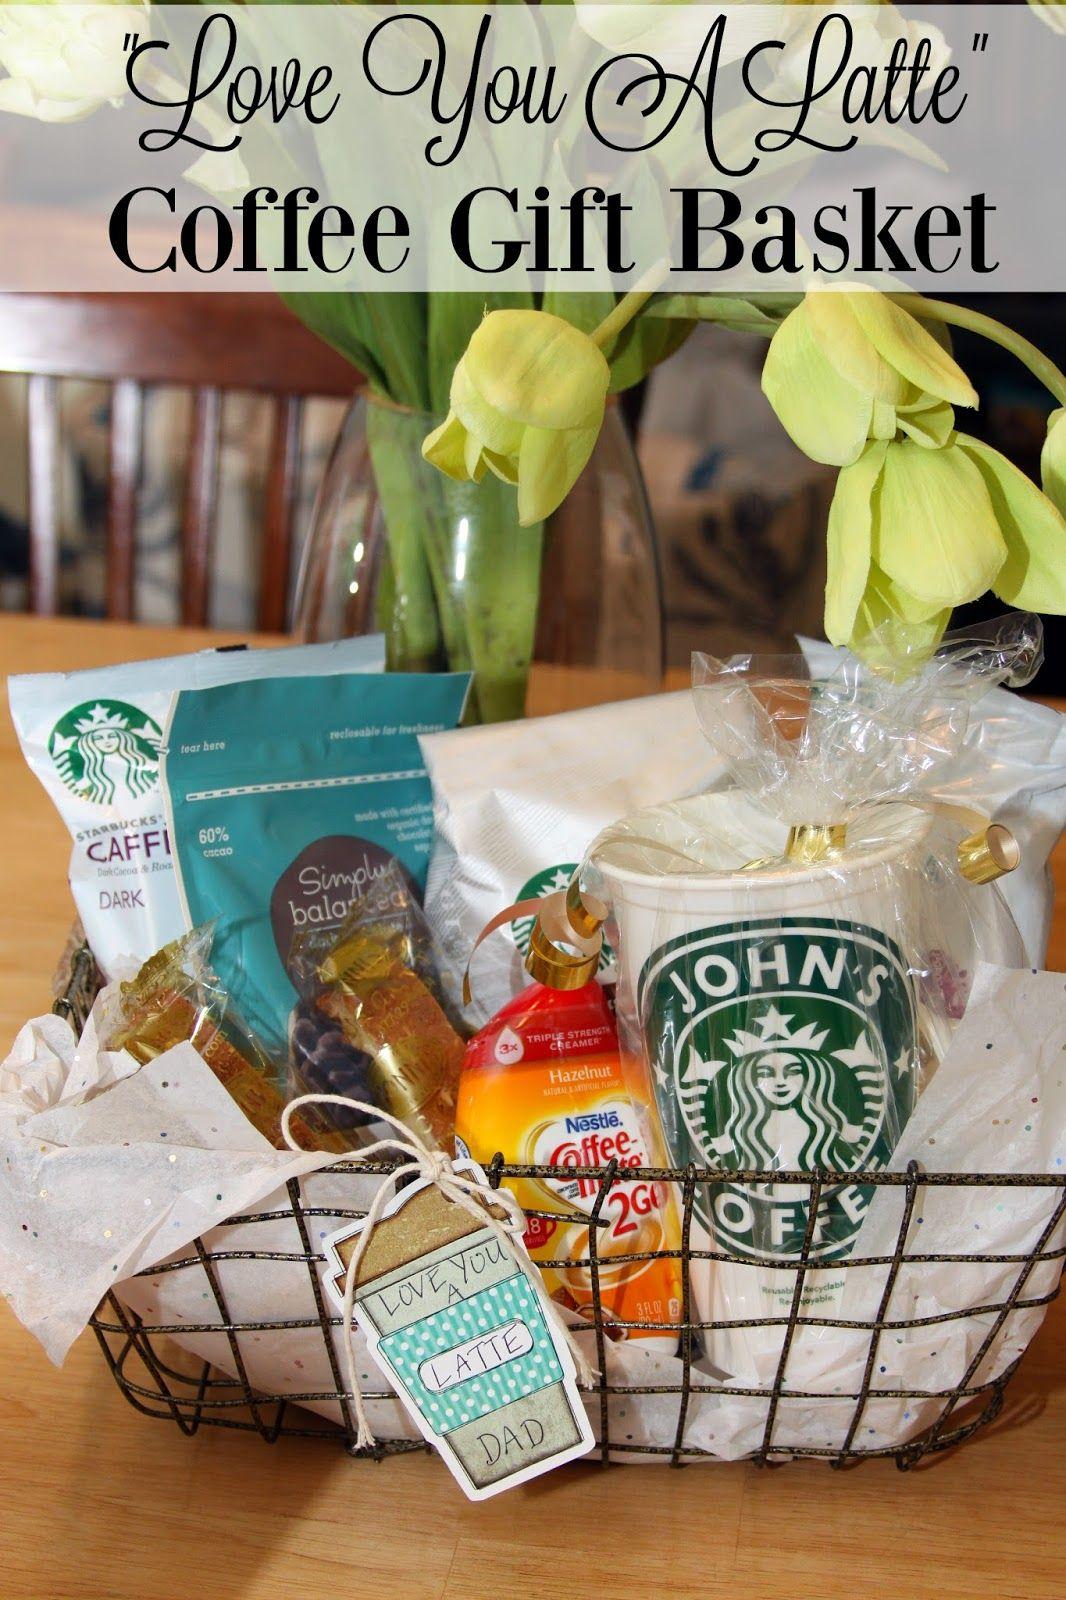 Ninja Coffee Bar and Love You a Latte Gift Basket Coffee